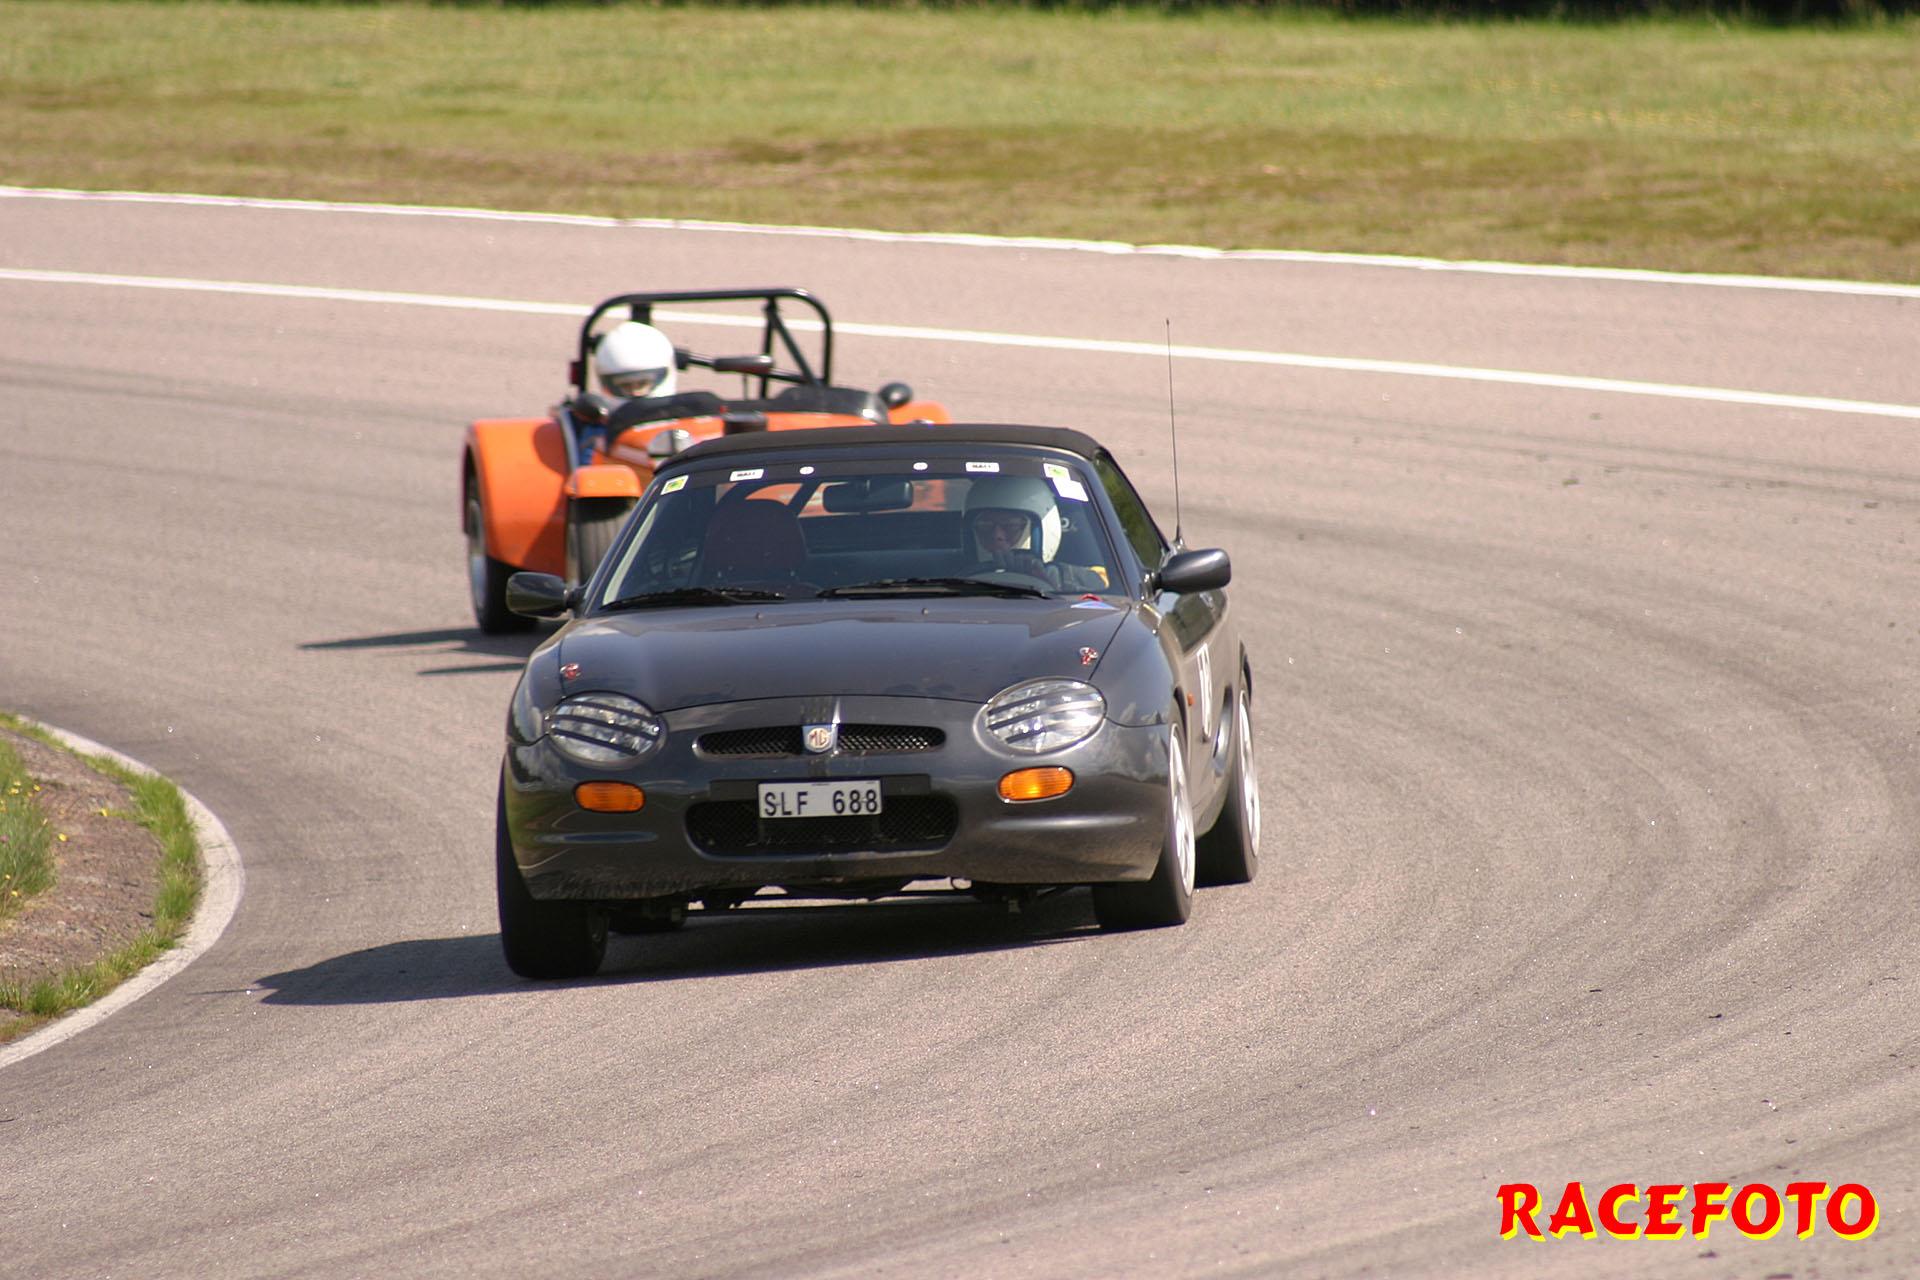 Sportvagnsserien på Anderstorp, endagsrace